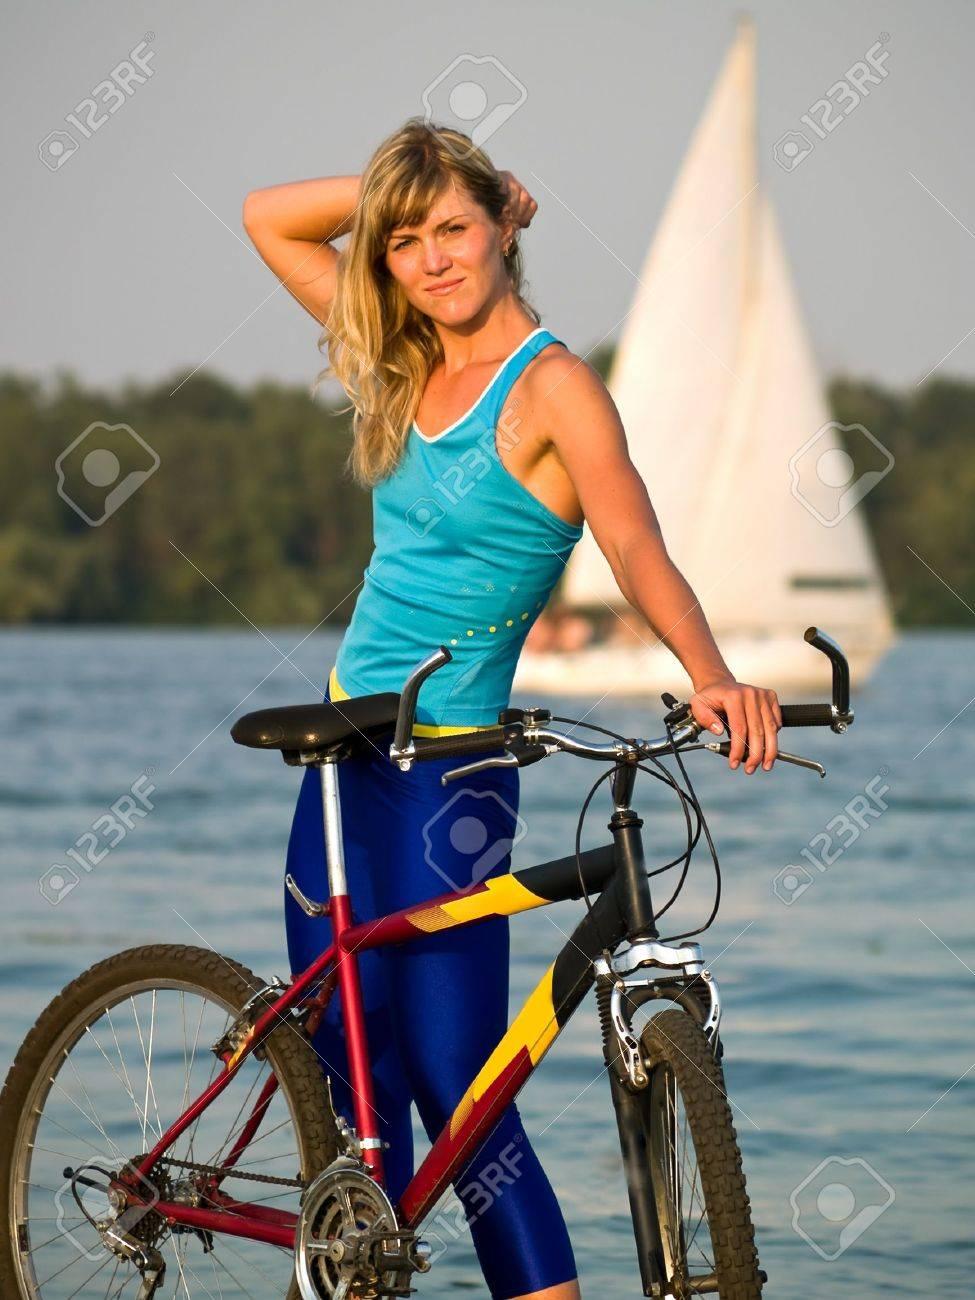 Pour Nike Air Air Cycliste Femme Cycliste Nike Pour UVpSMqz